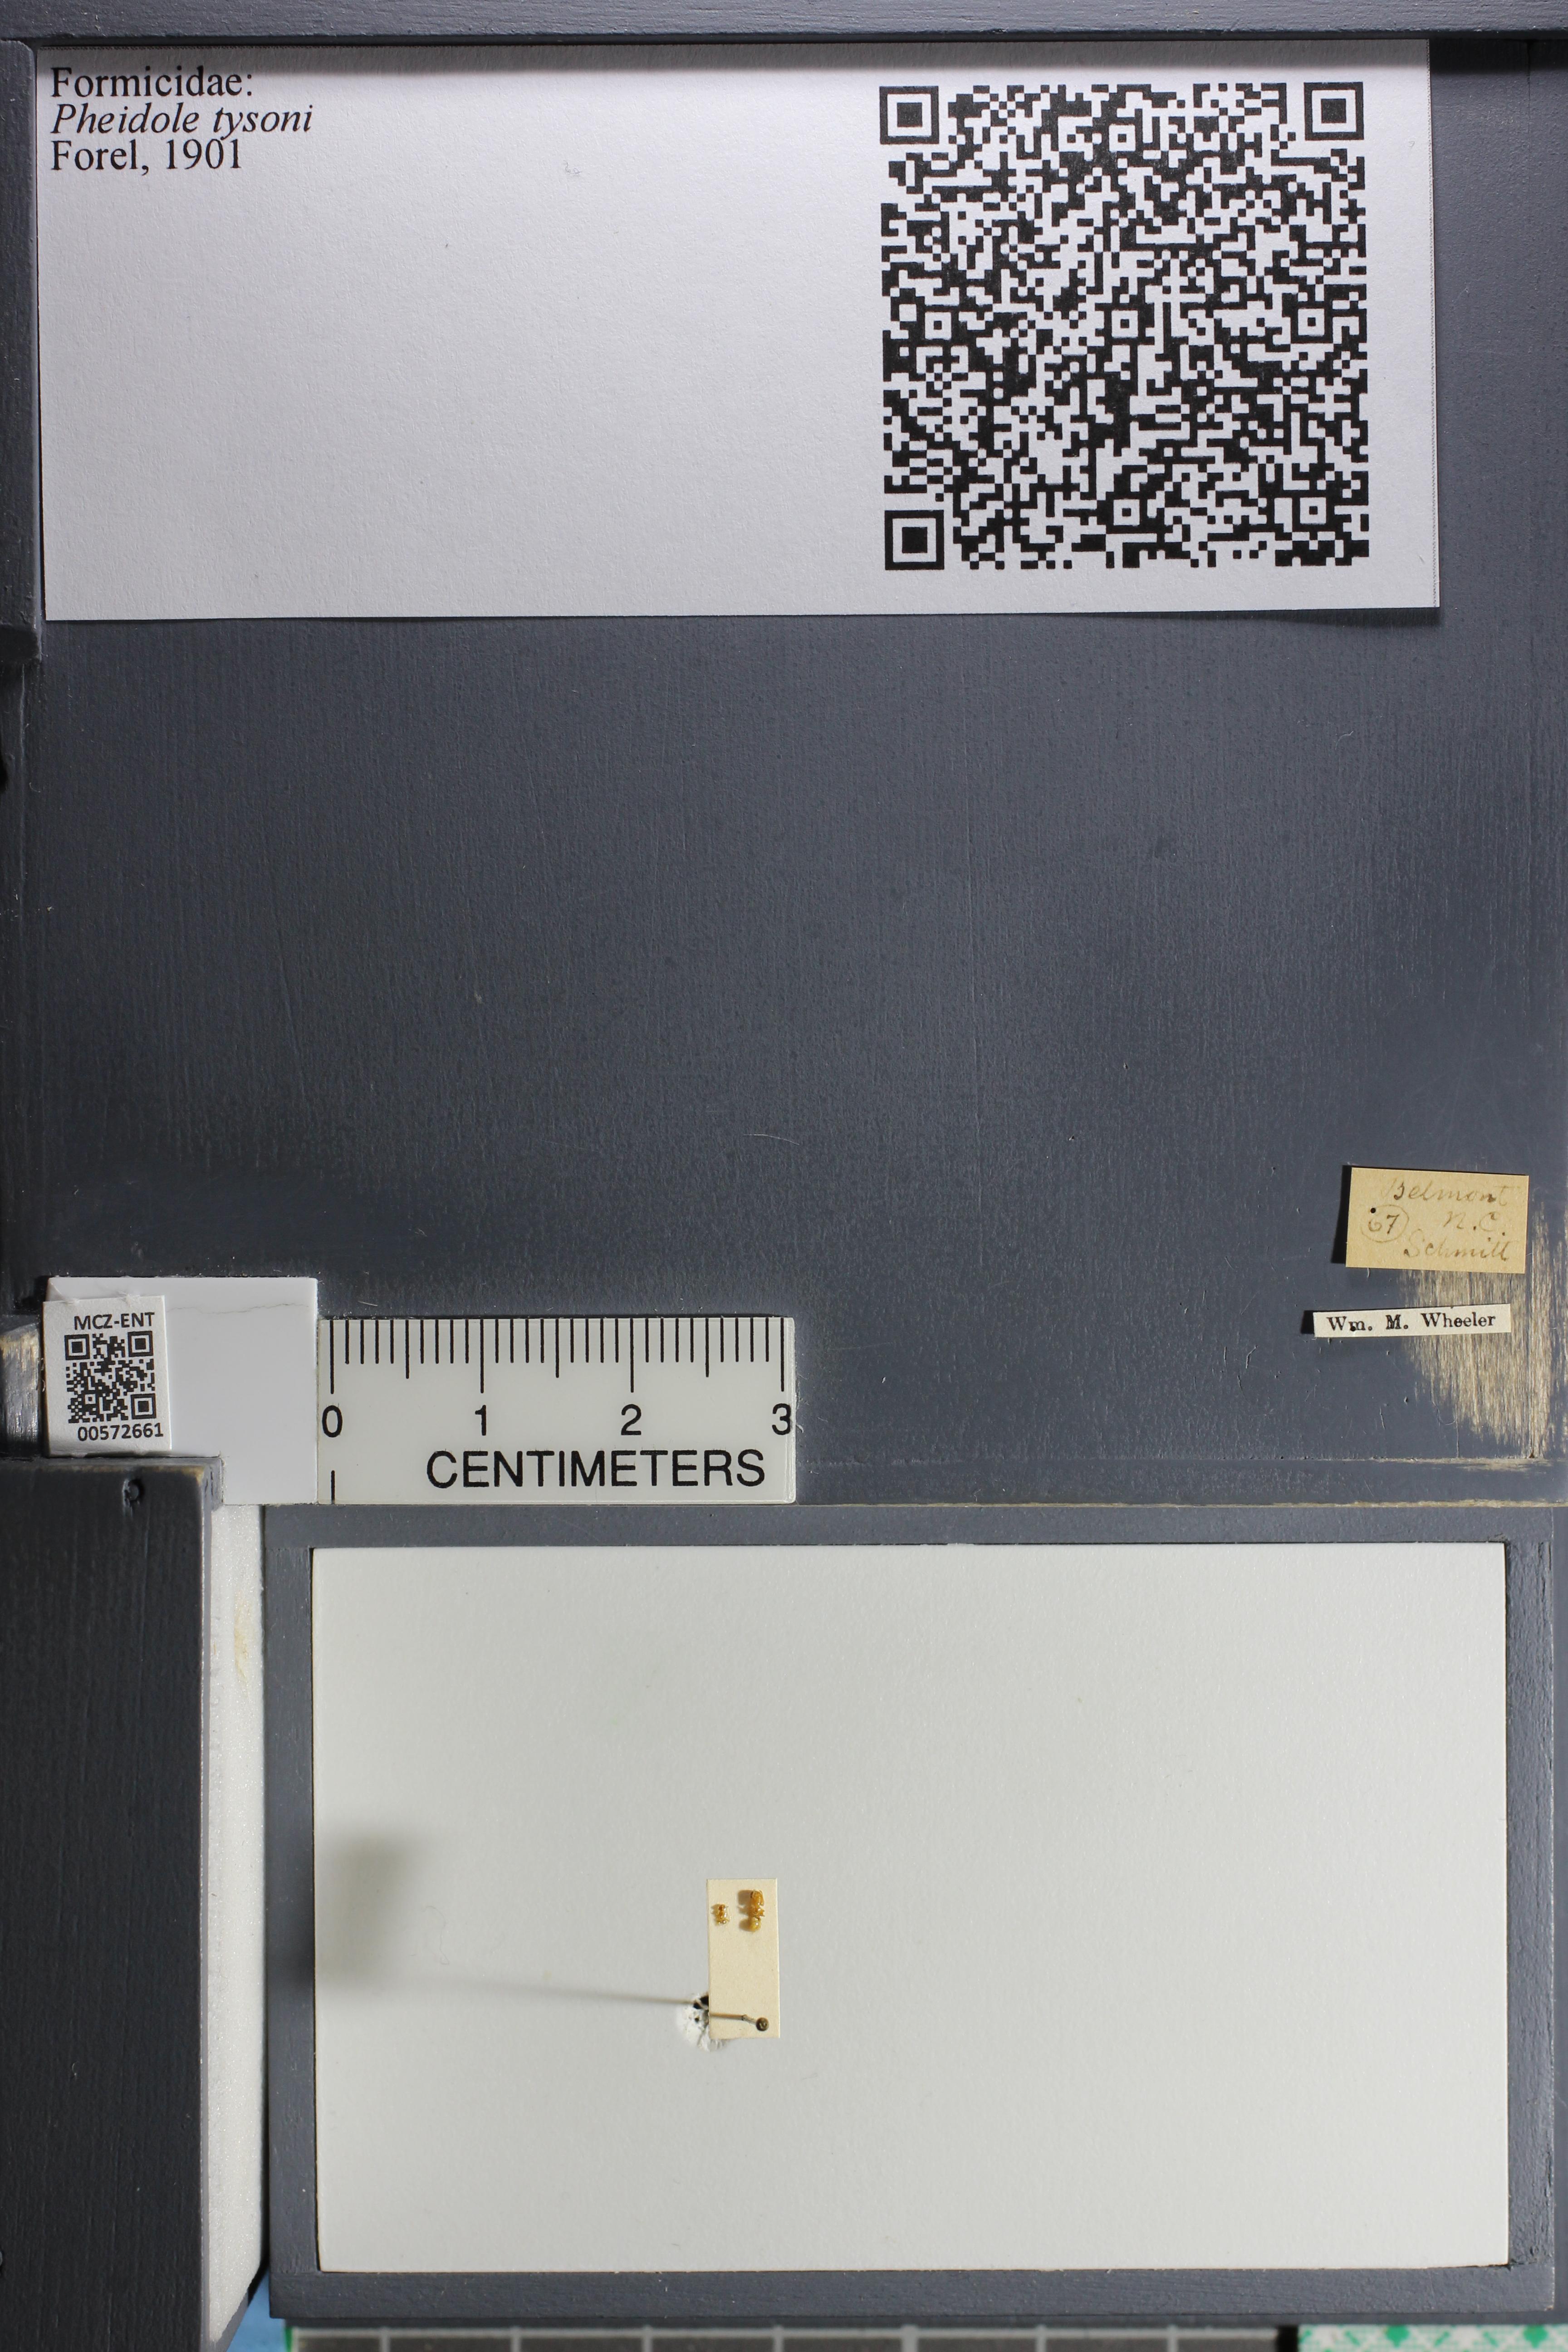 Media of type image, MCZ:Ent:572661 Identified as Pheidole tysoni.